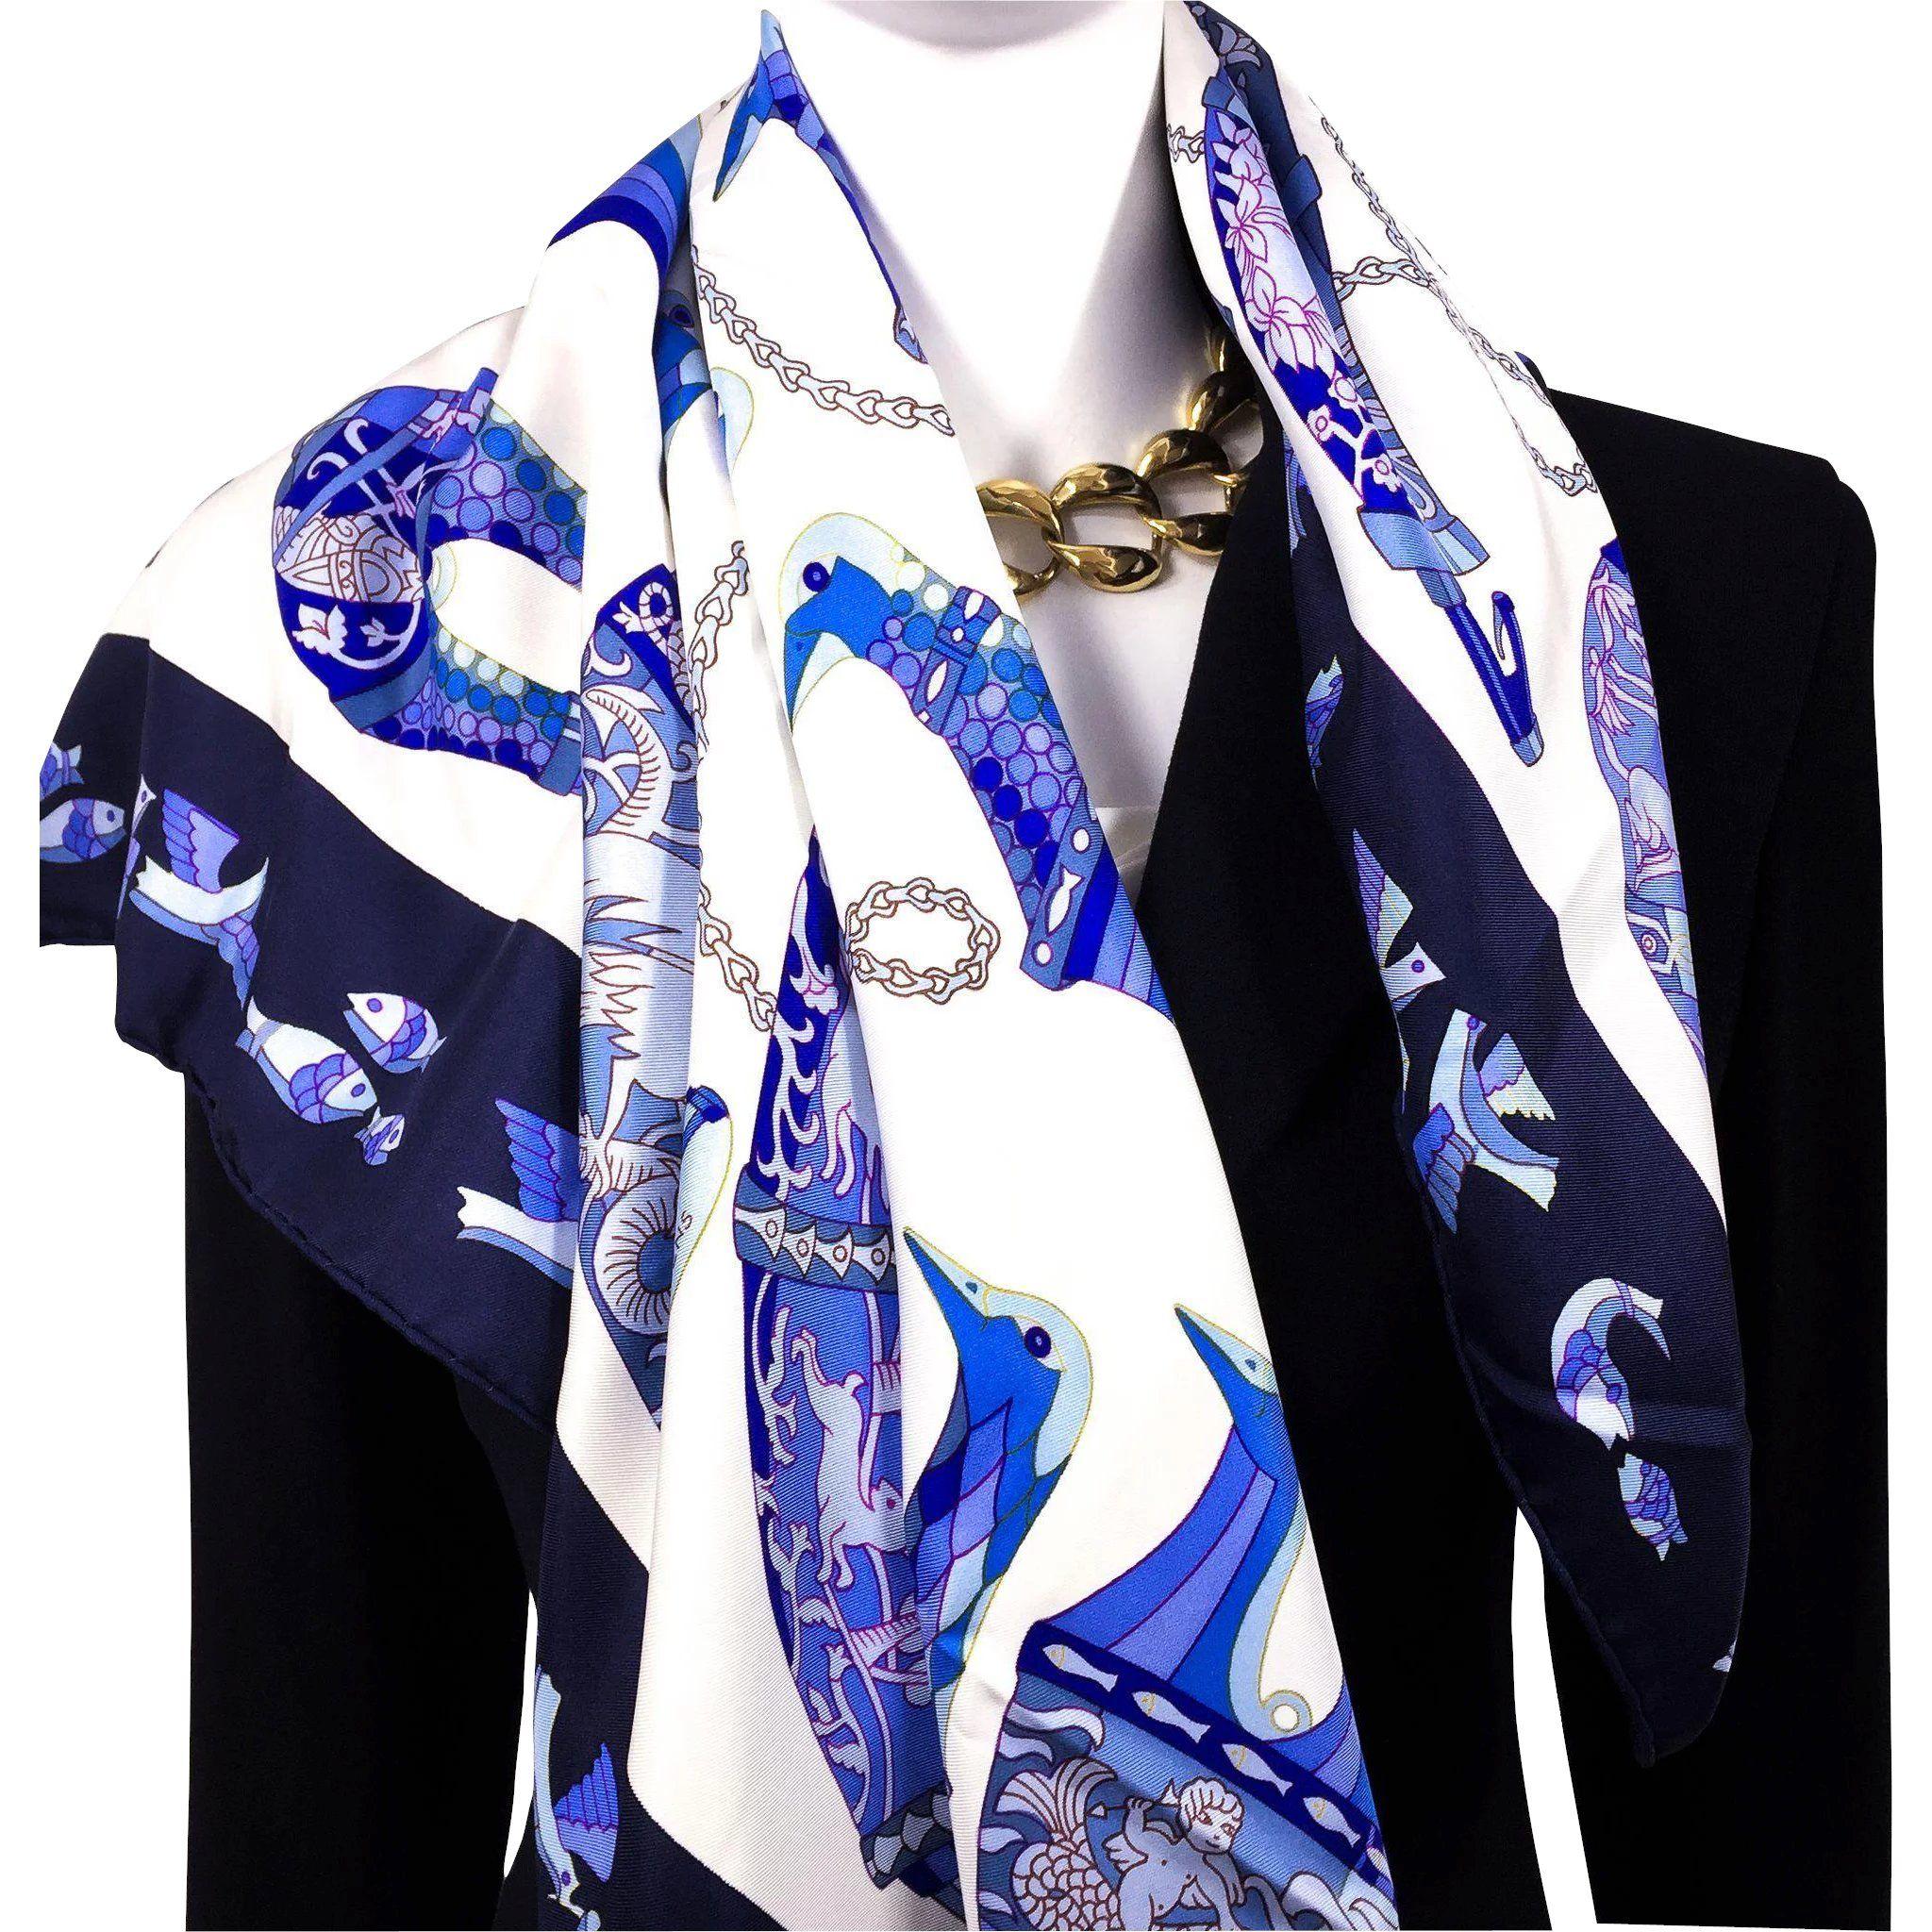 Rhytons Hermes Silk Scarf 100 Silk Grail W Box Www Rubylane Com Vintagebeginshere Holiday Giftideas Fashi Blue White Hermes Fashion